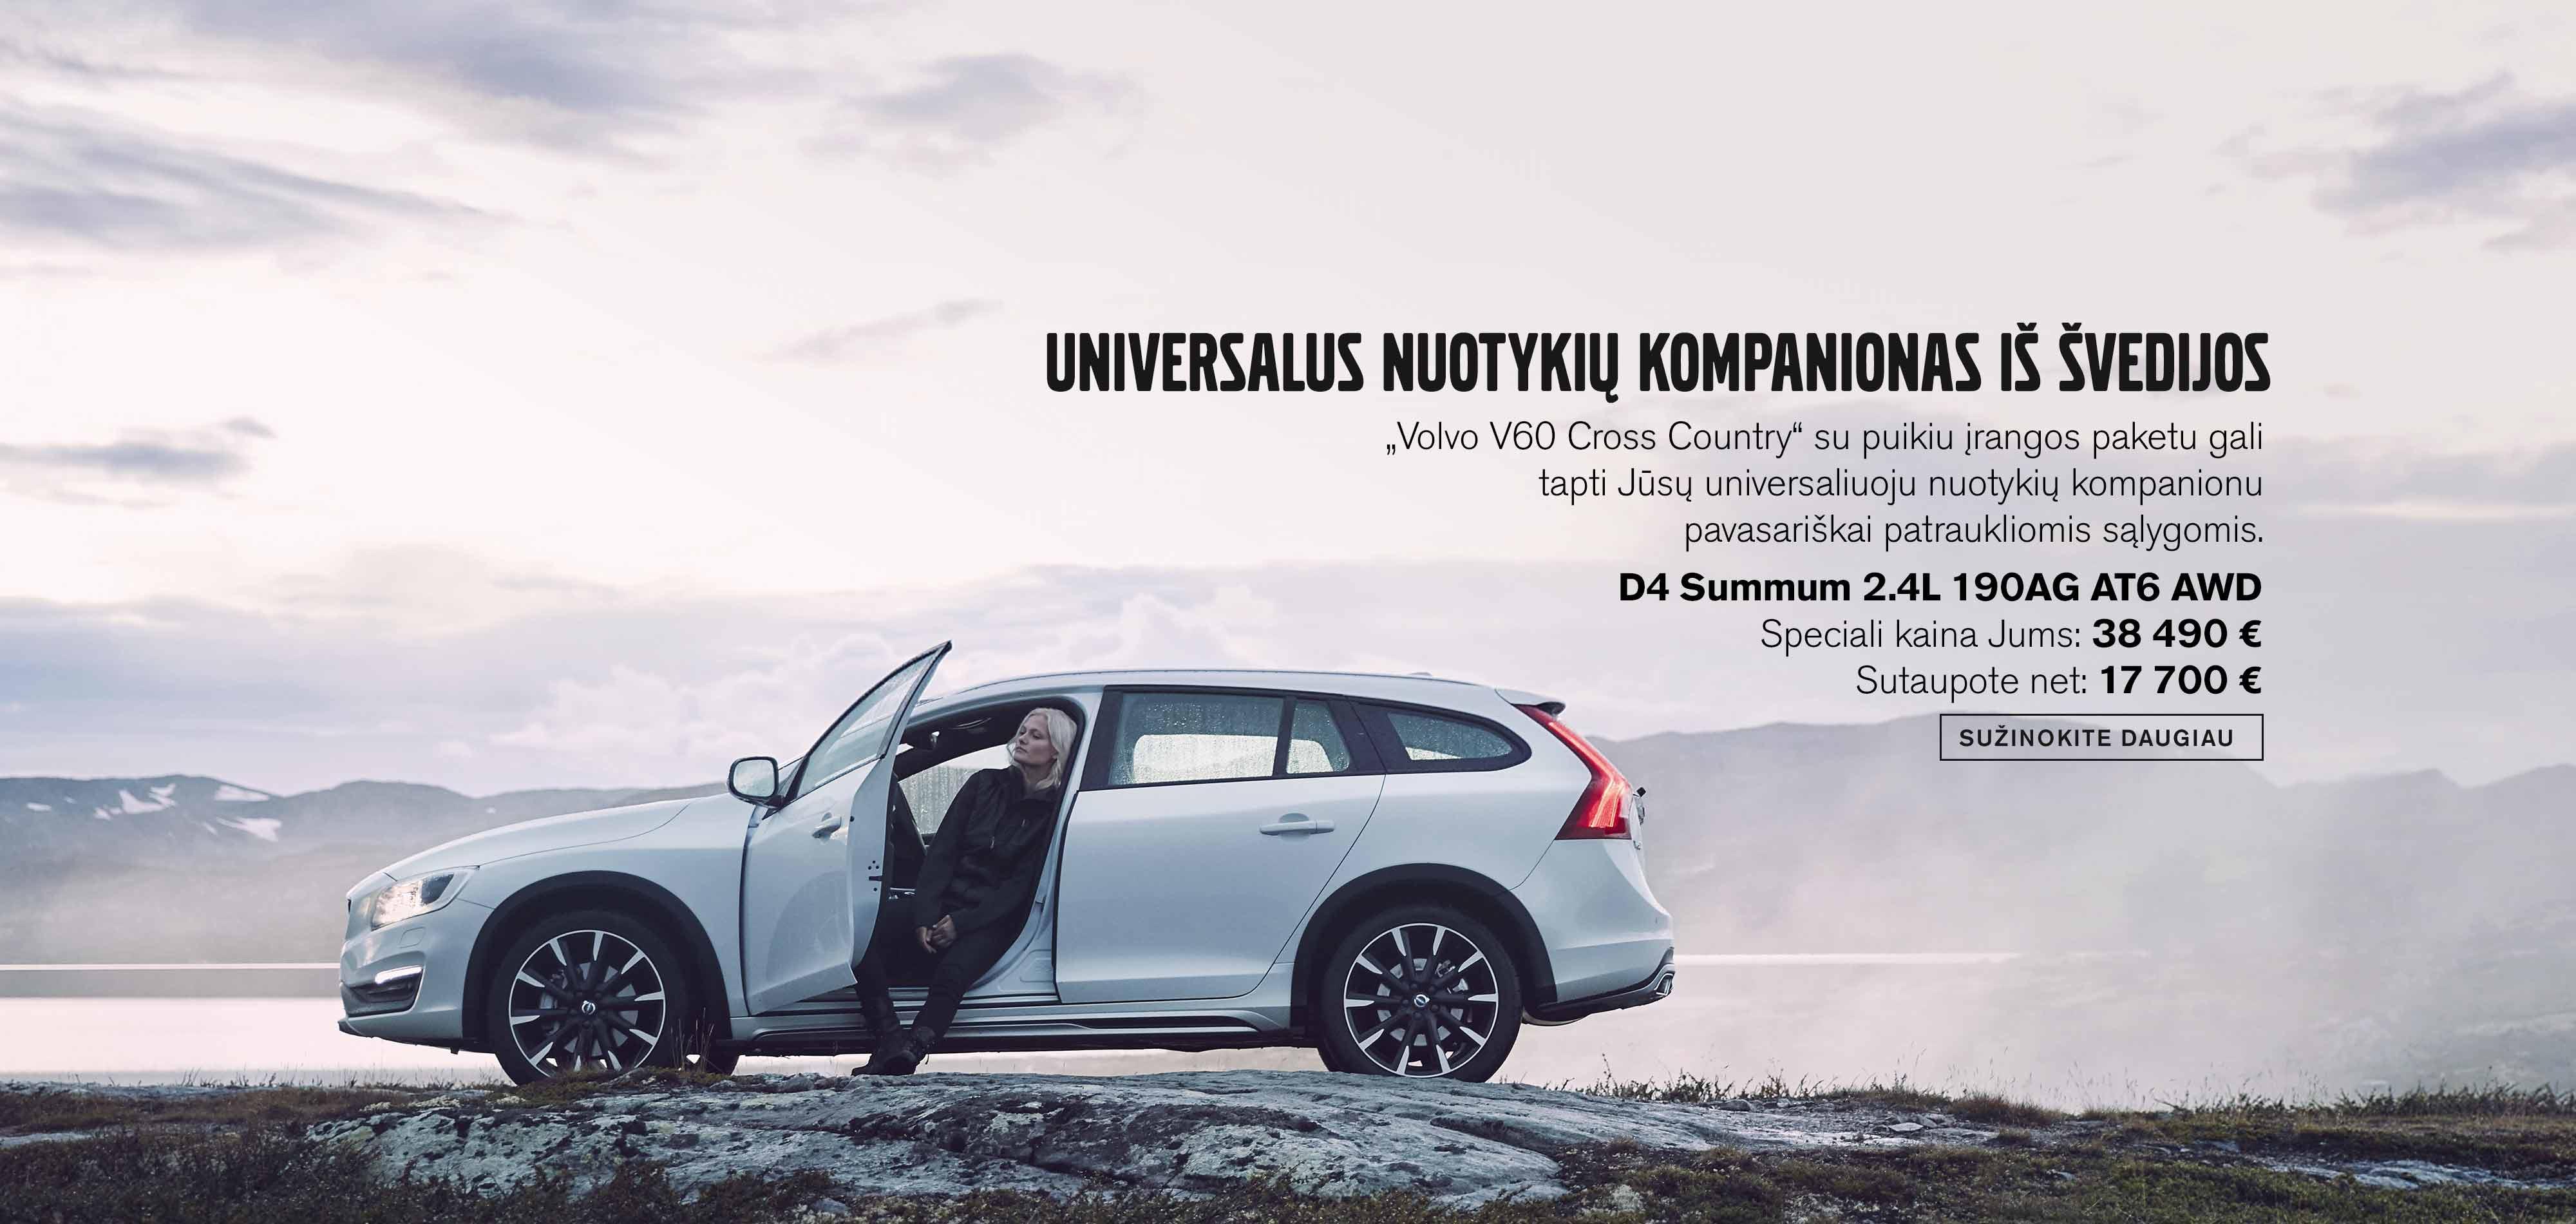 Švediška klasika - Volvo V60 Cross Country